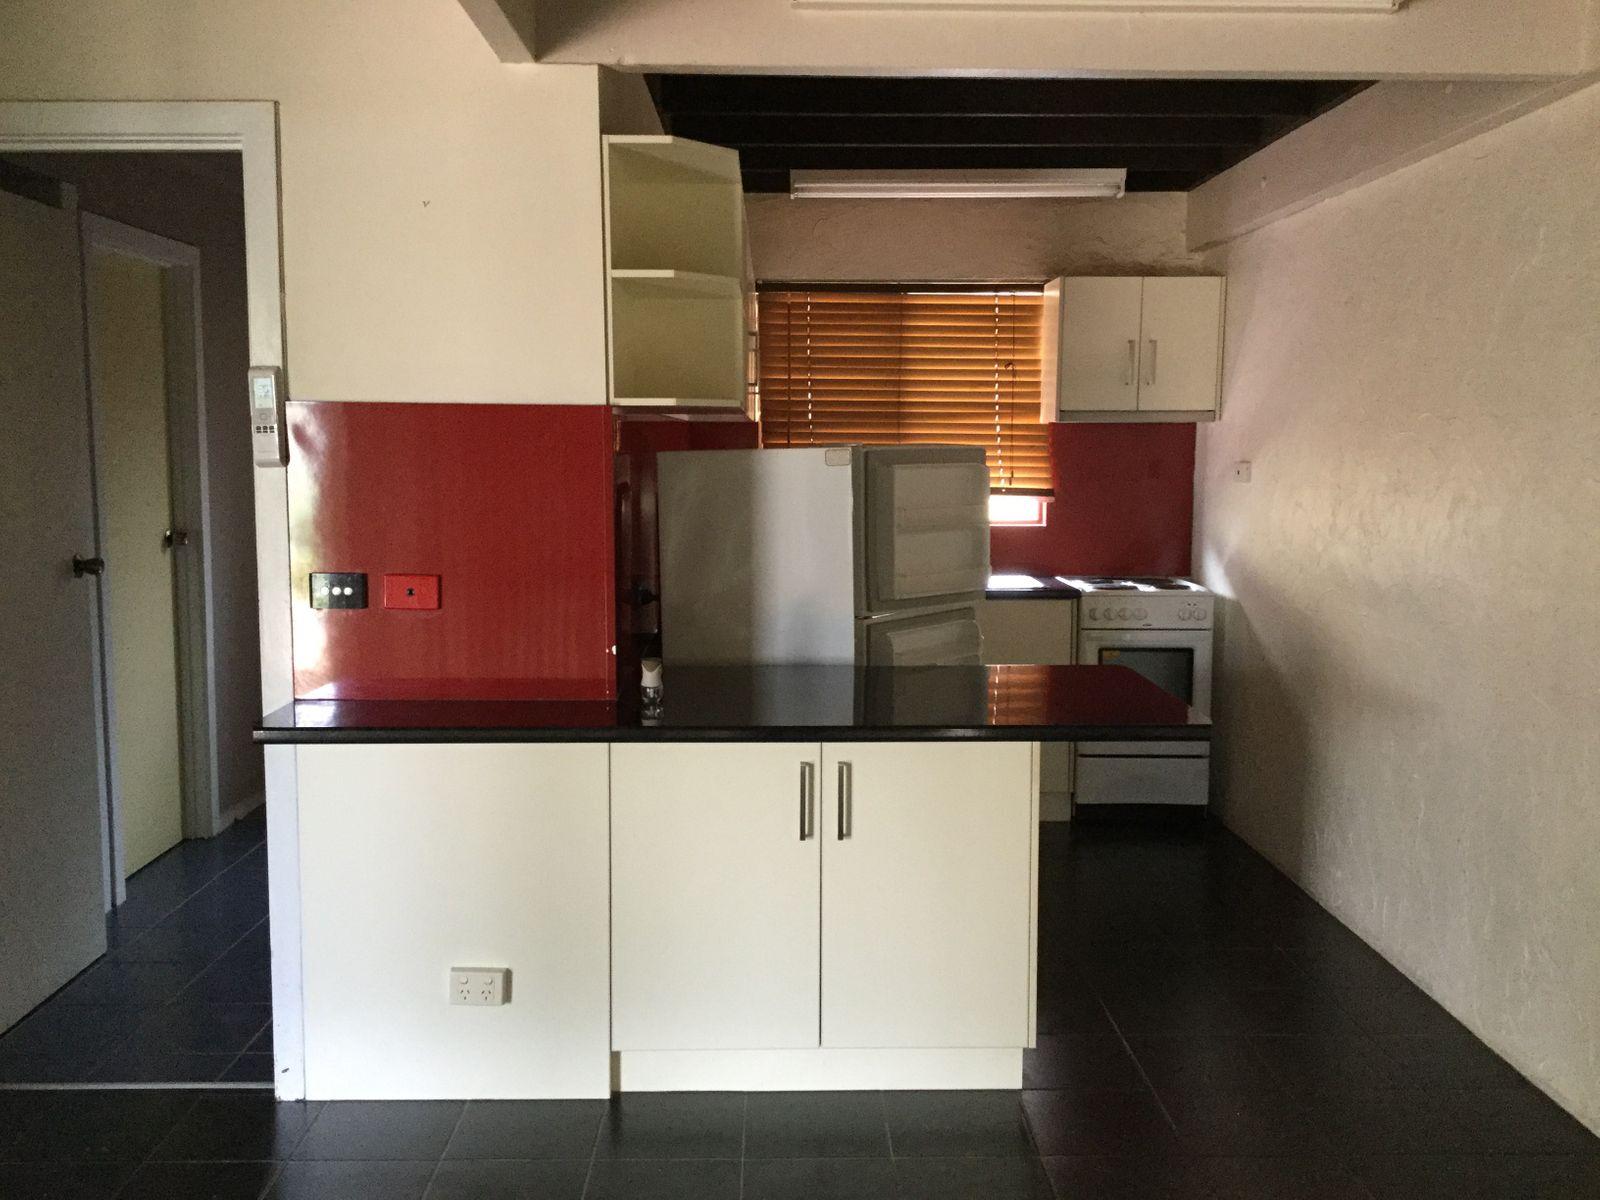 2/24 Adelaide Street, Gol Gol, NSW 2738